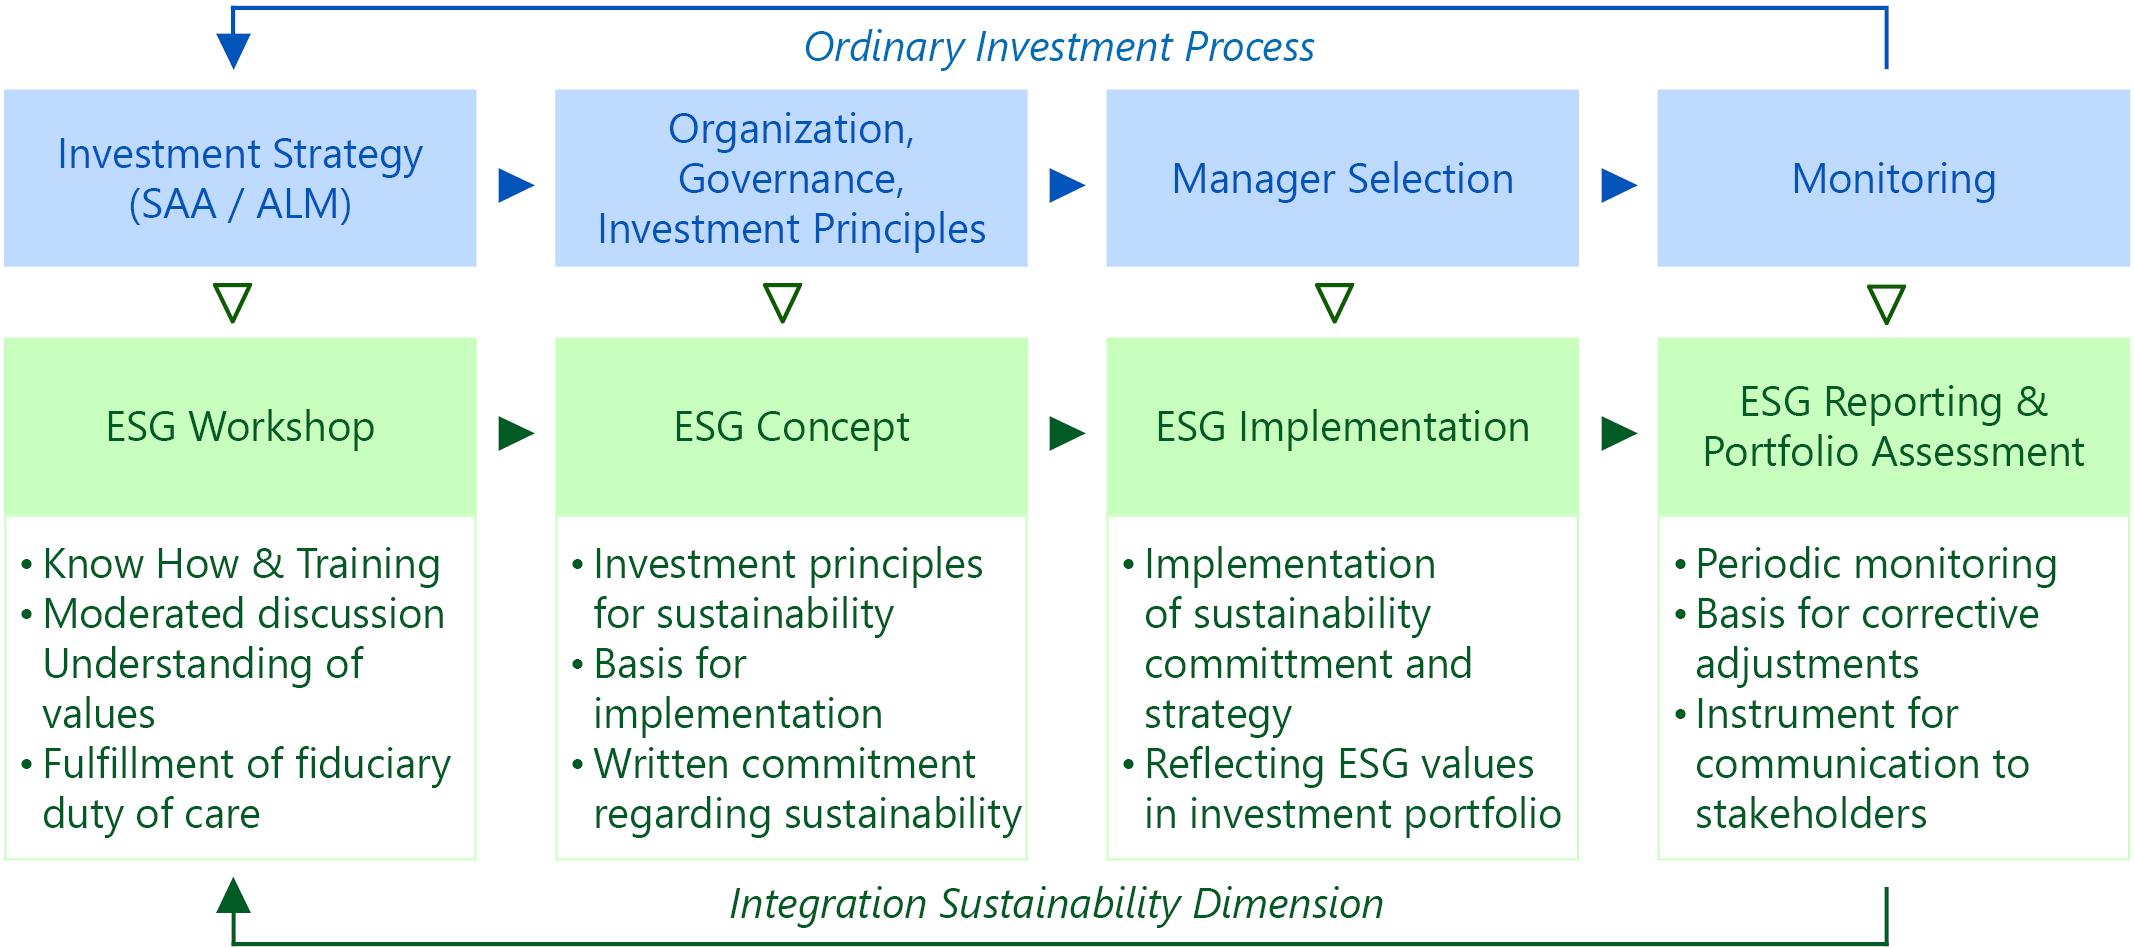 Invetment Process & ESG Dimension